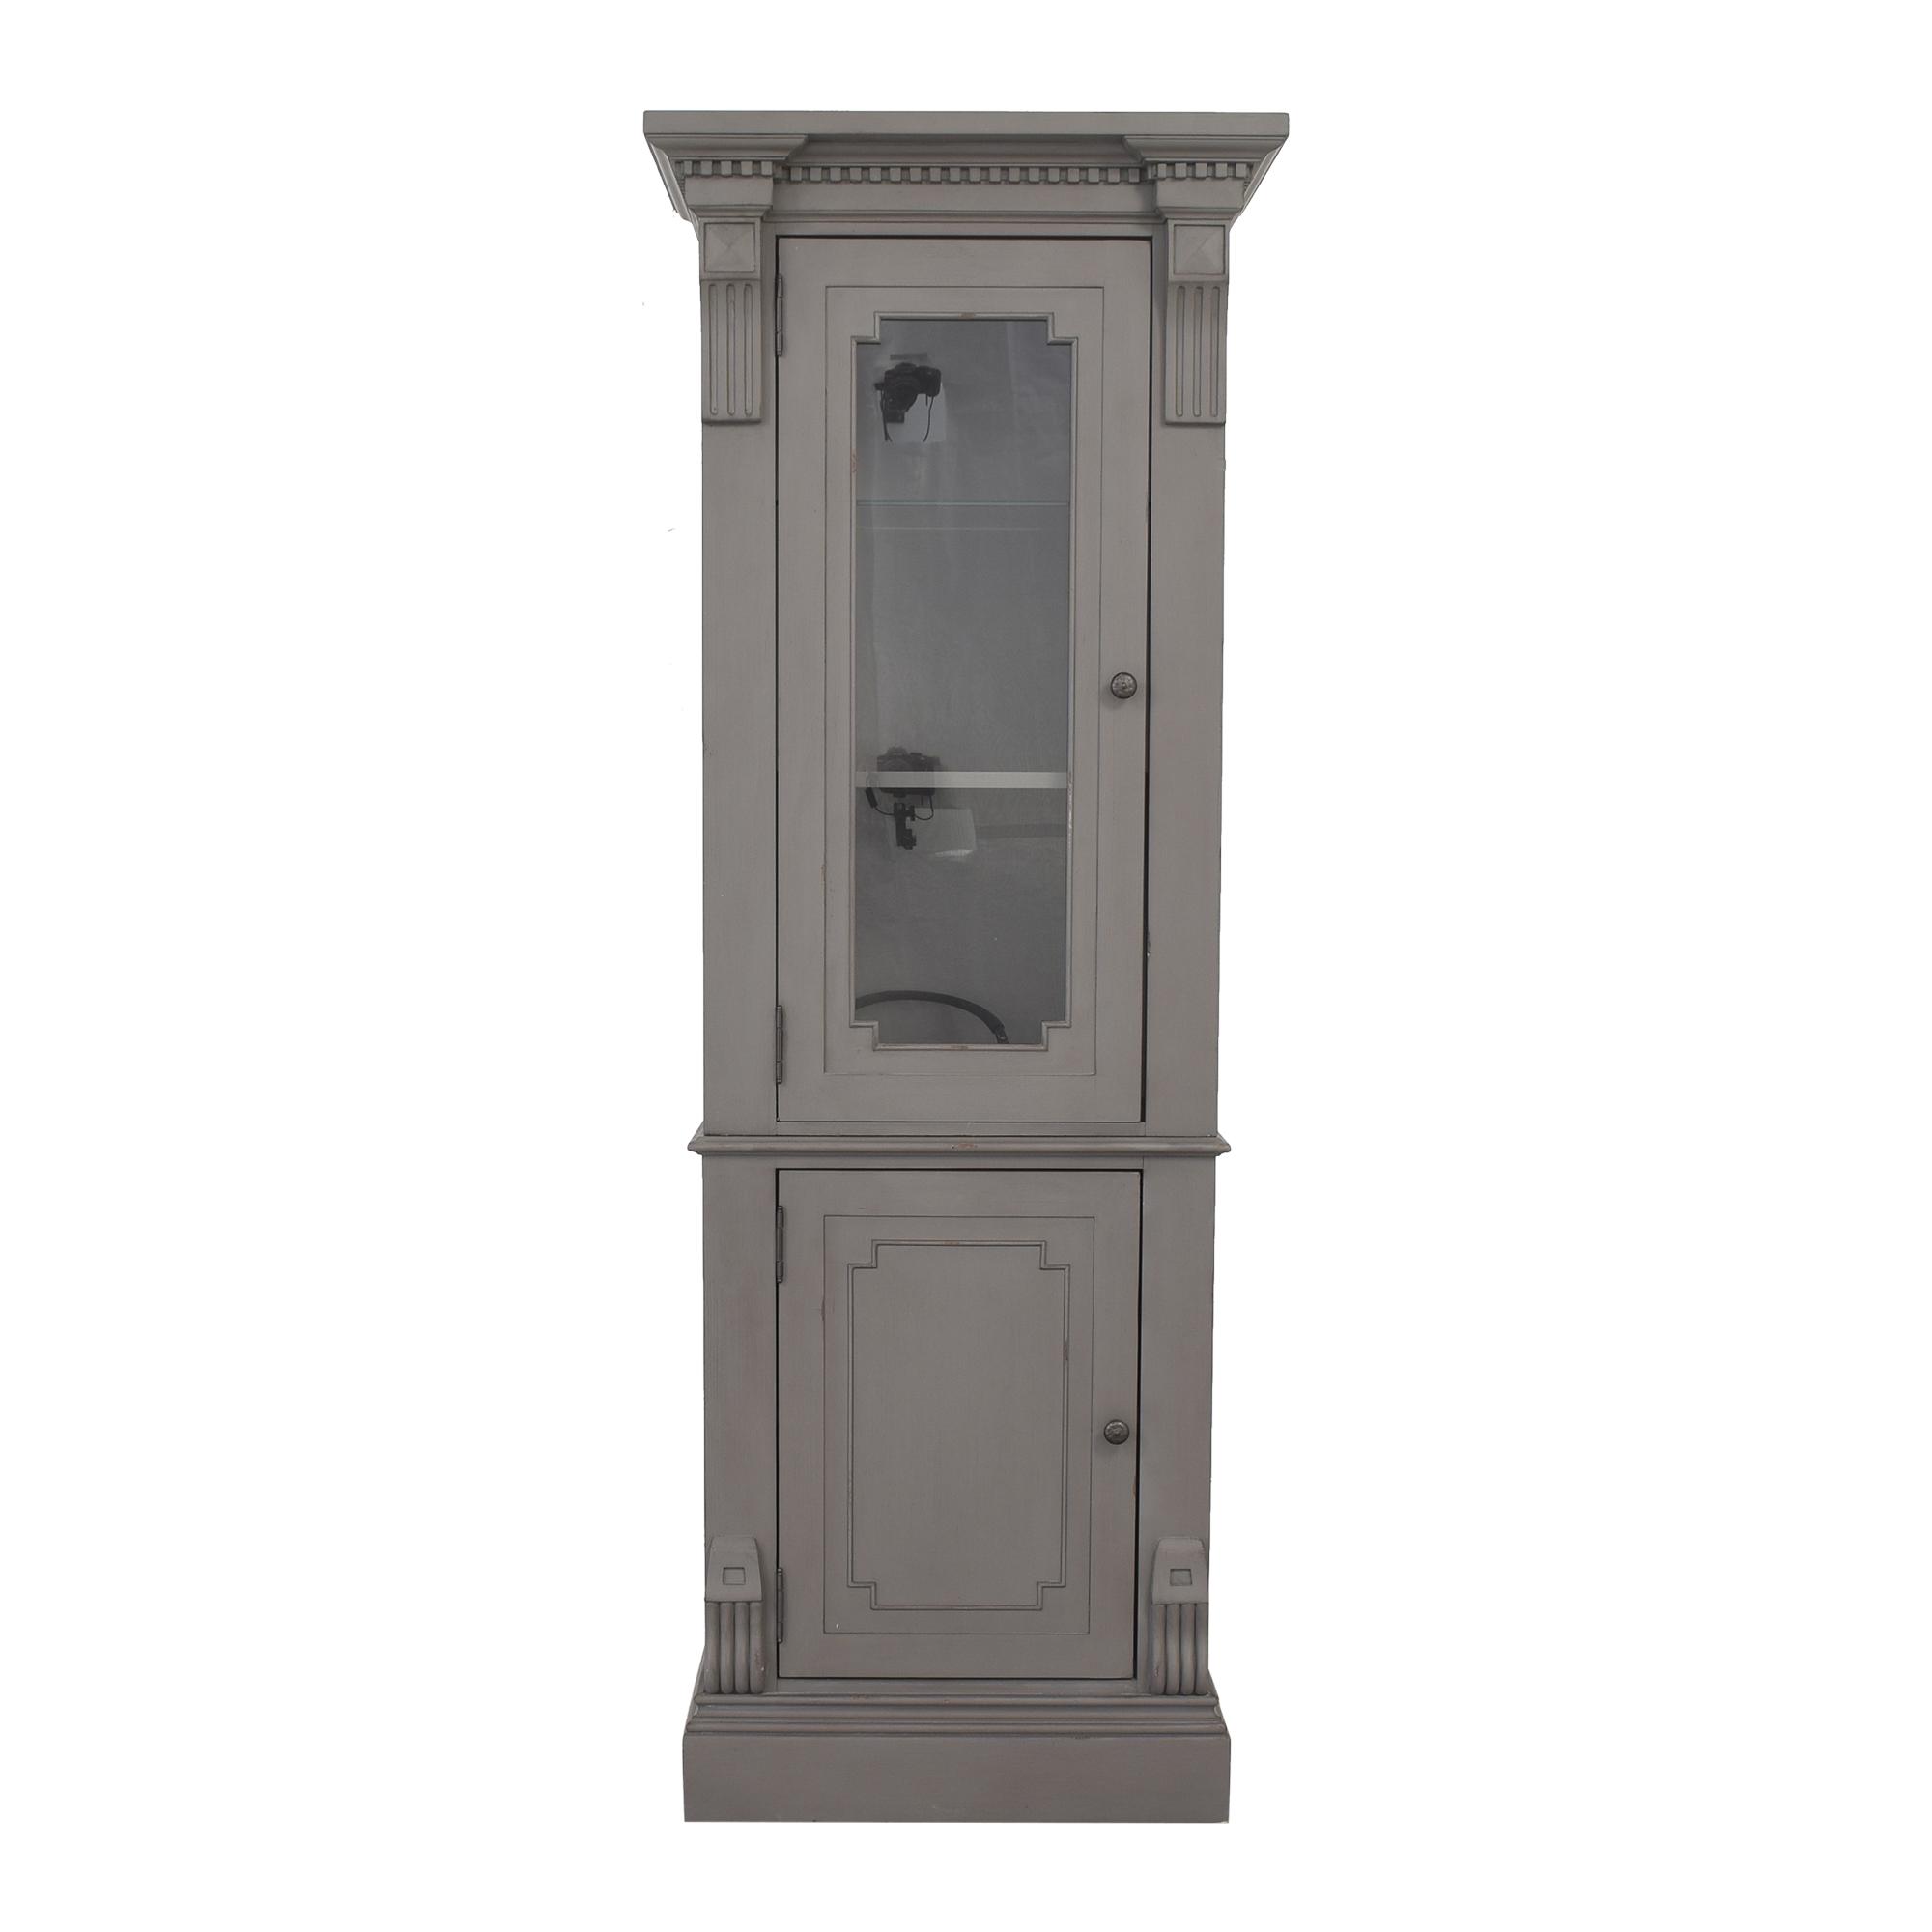 Restoration Hardware St. James Tall Bath Cabinet / Storage